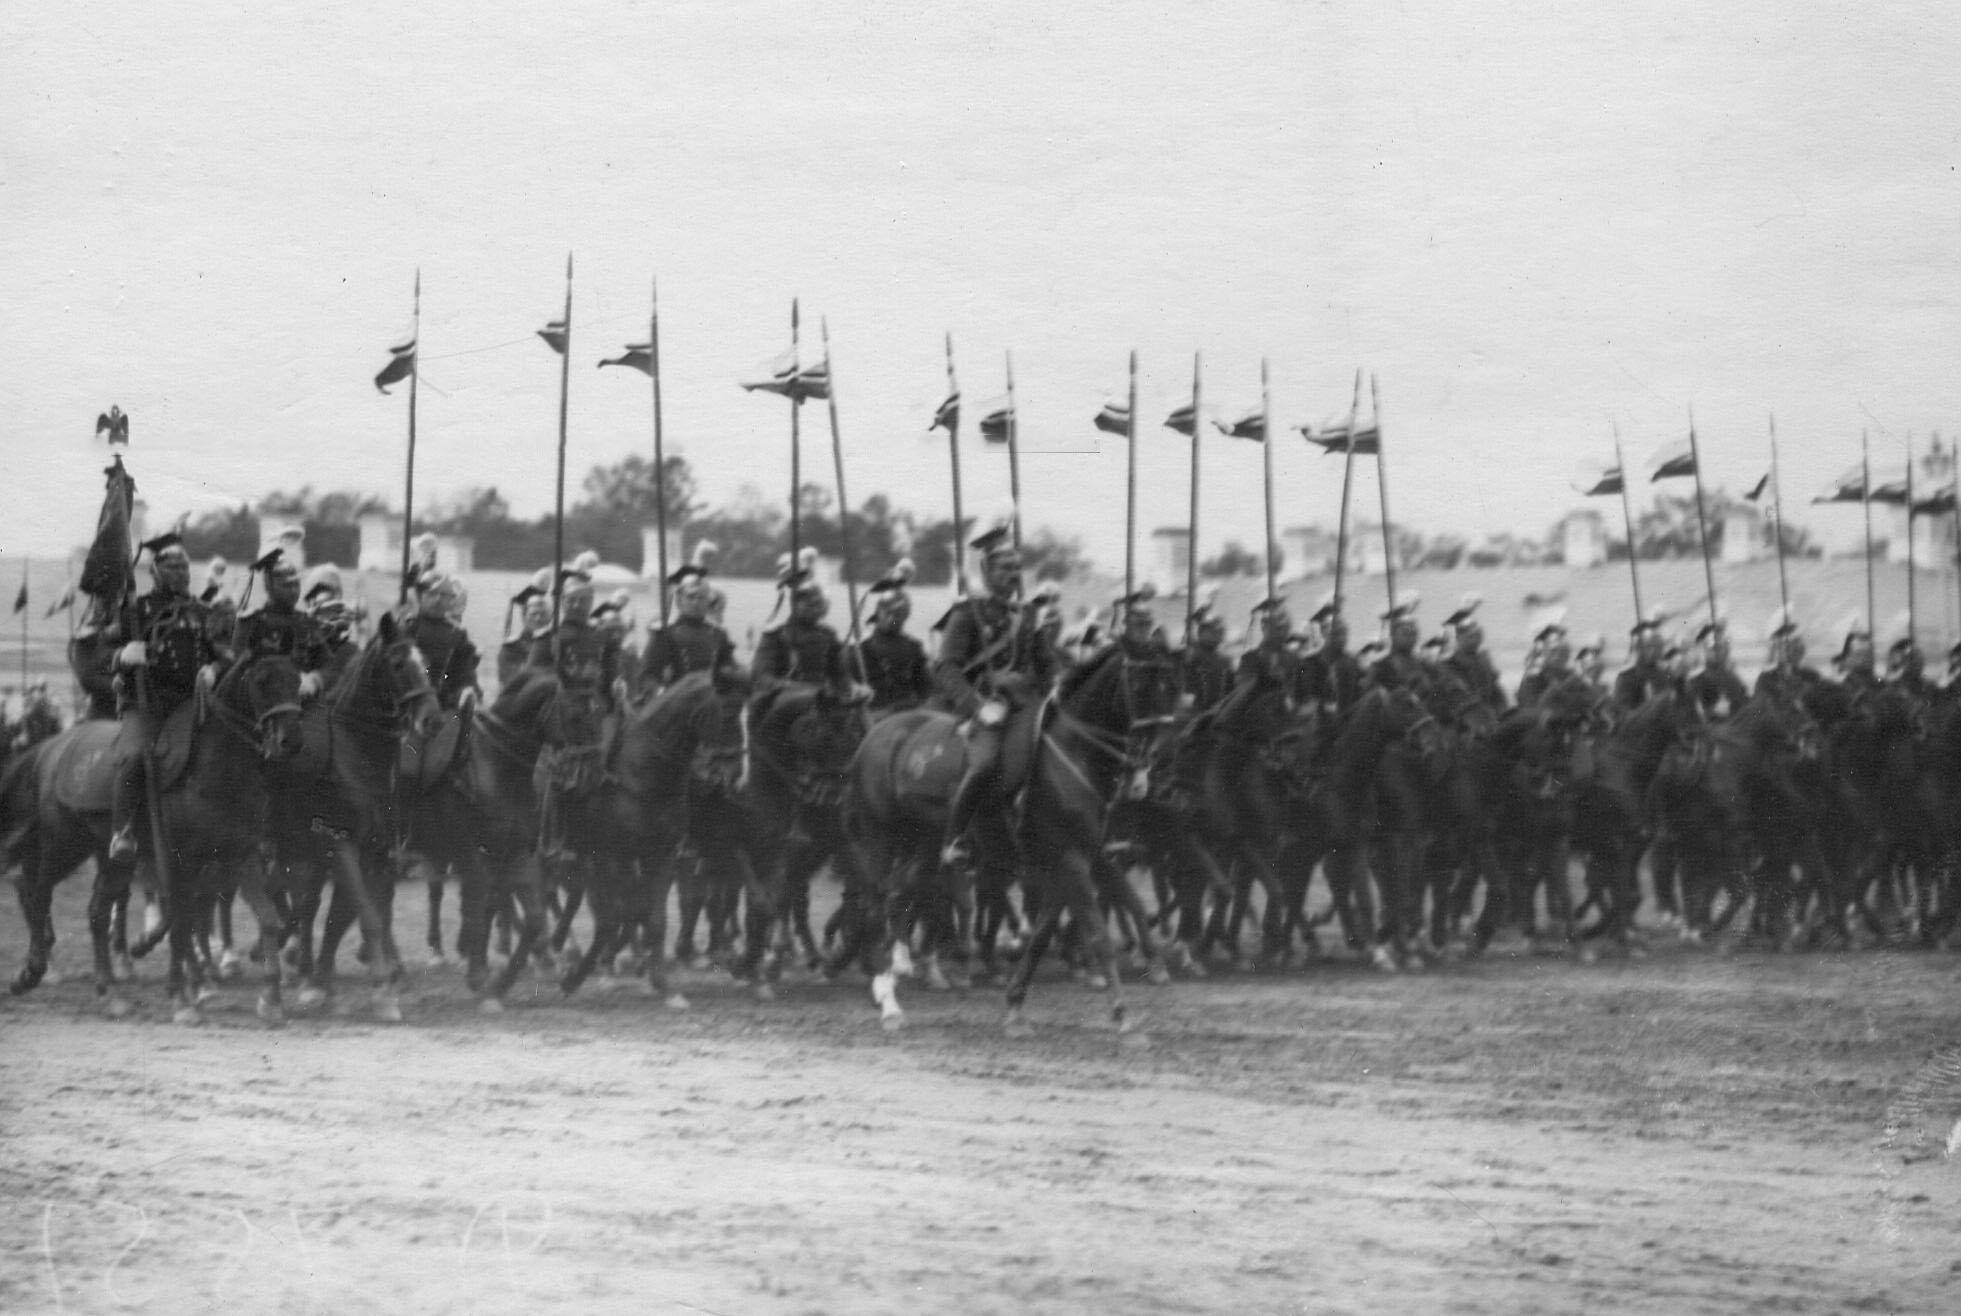 Лейб-эскадрон улан во время церемониального марша на параде полка